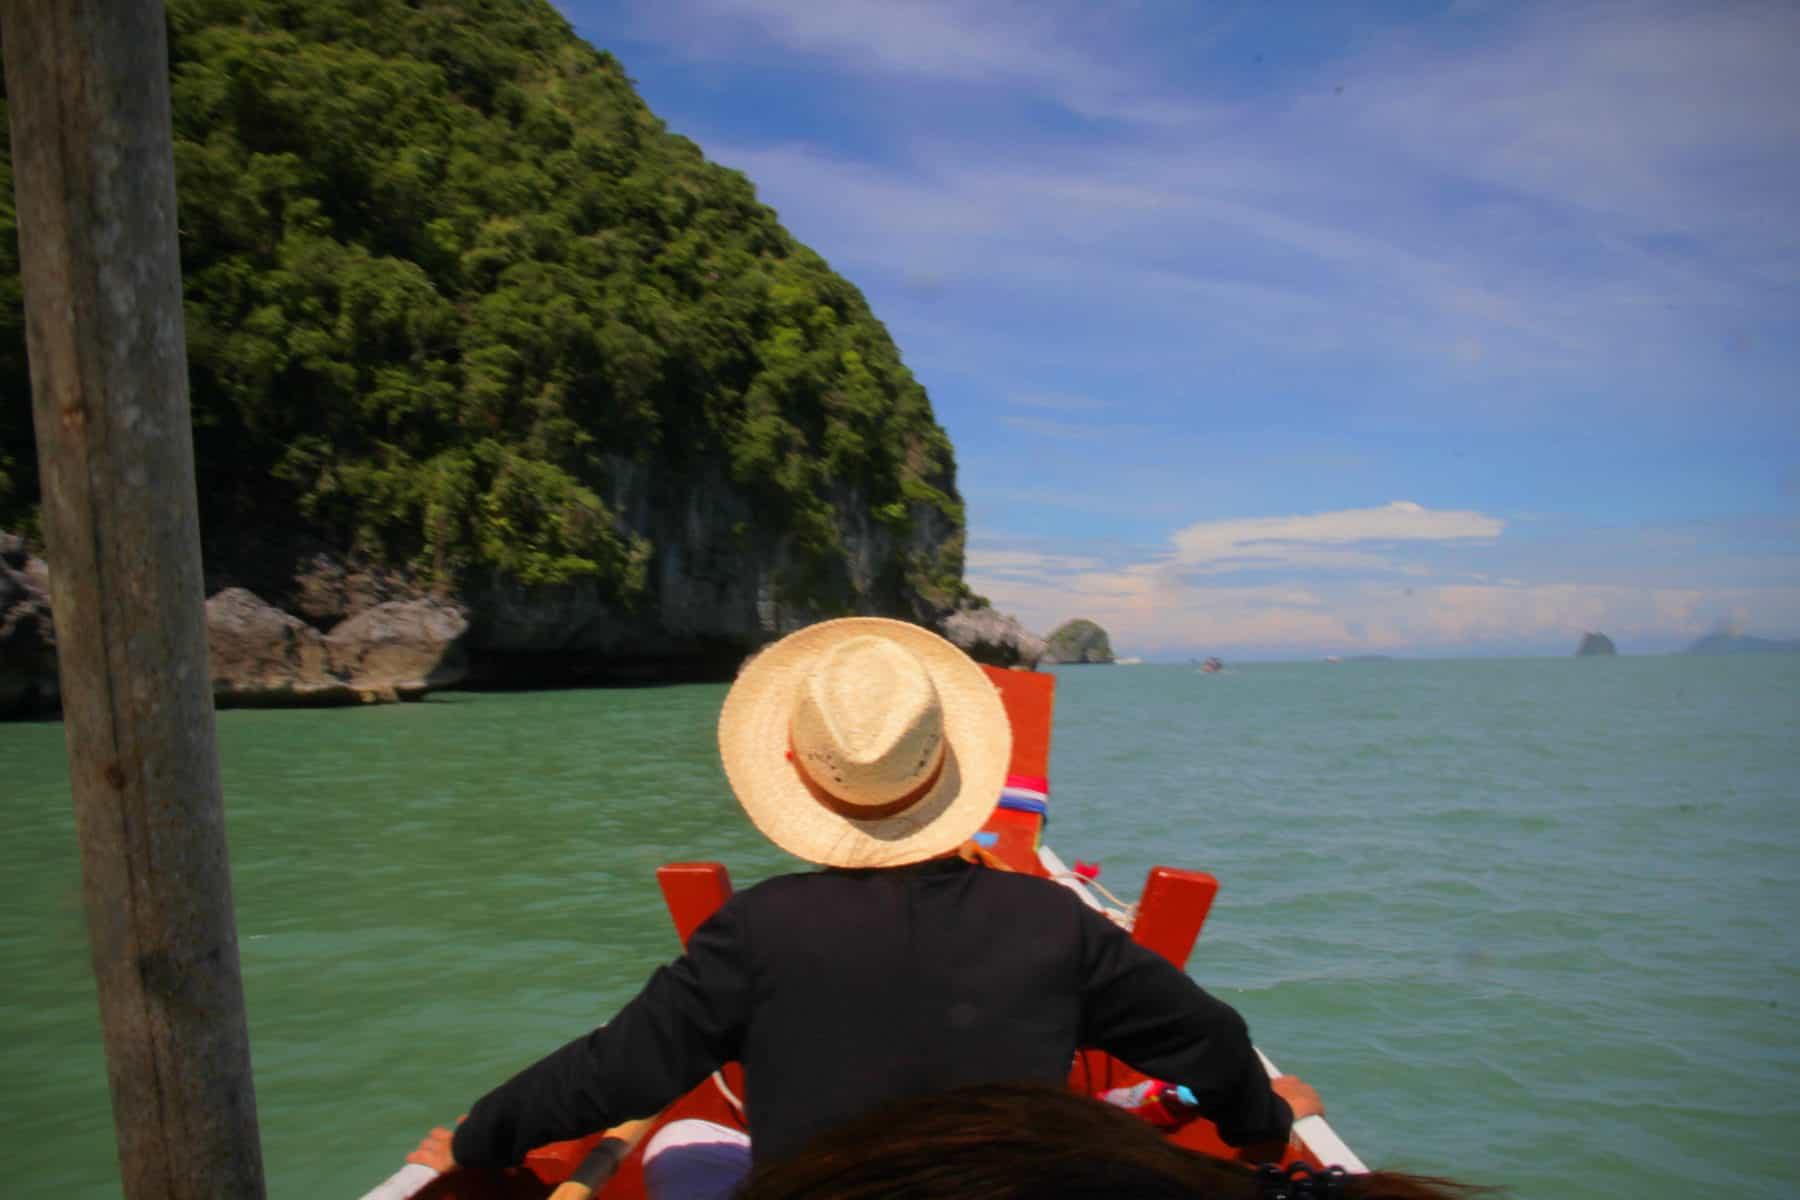 man sitting on a boat in Khanom in Thailand